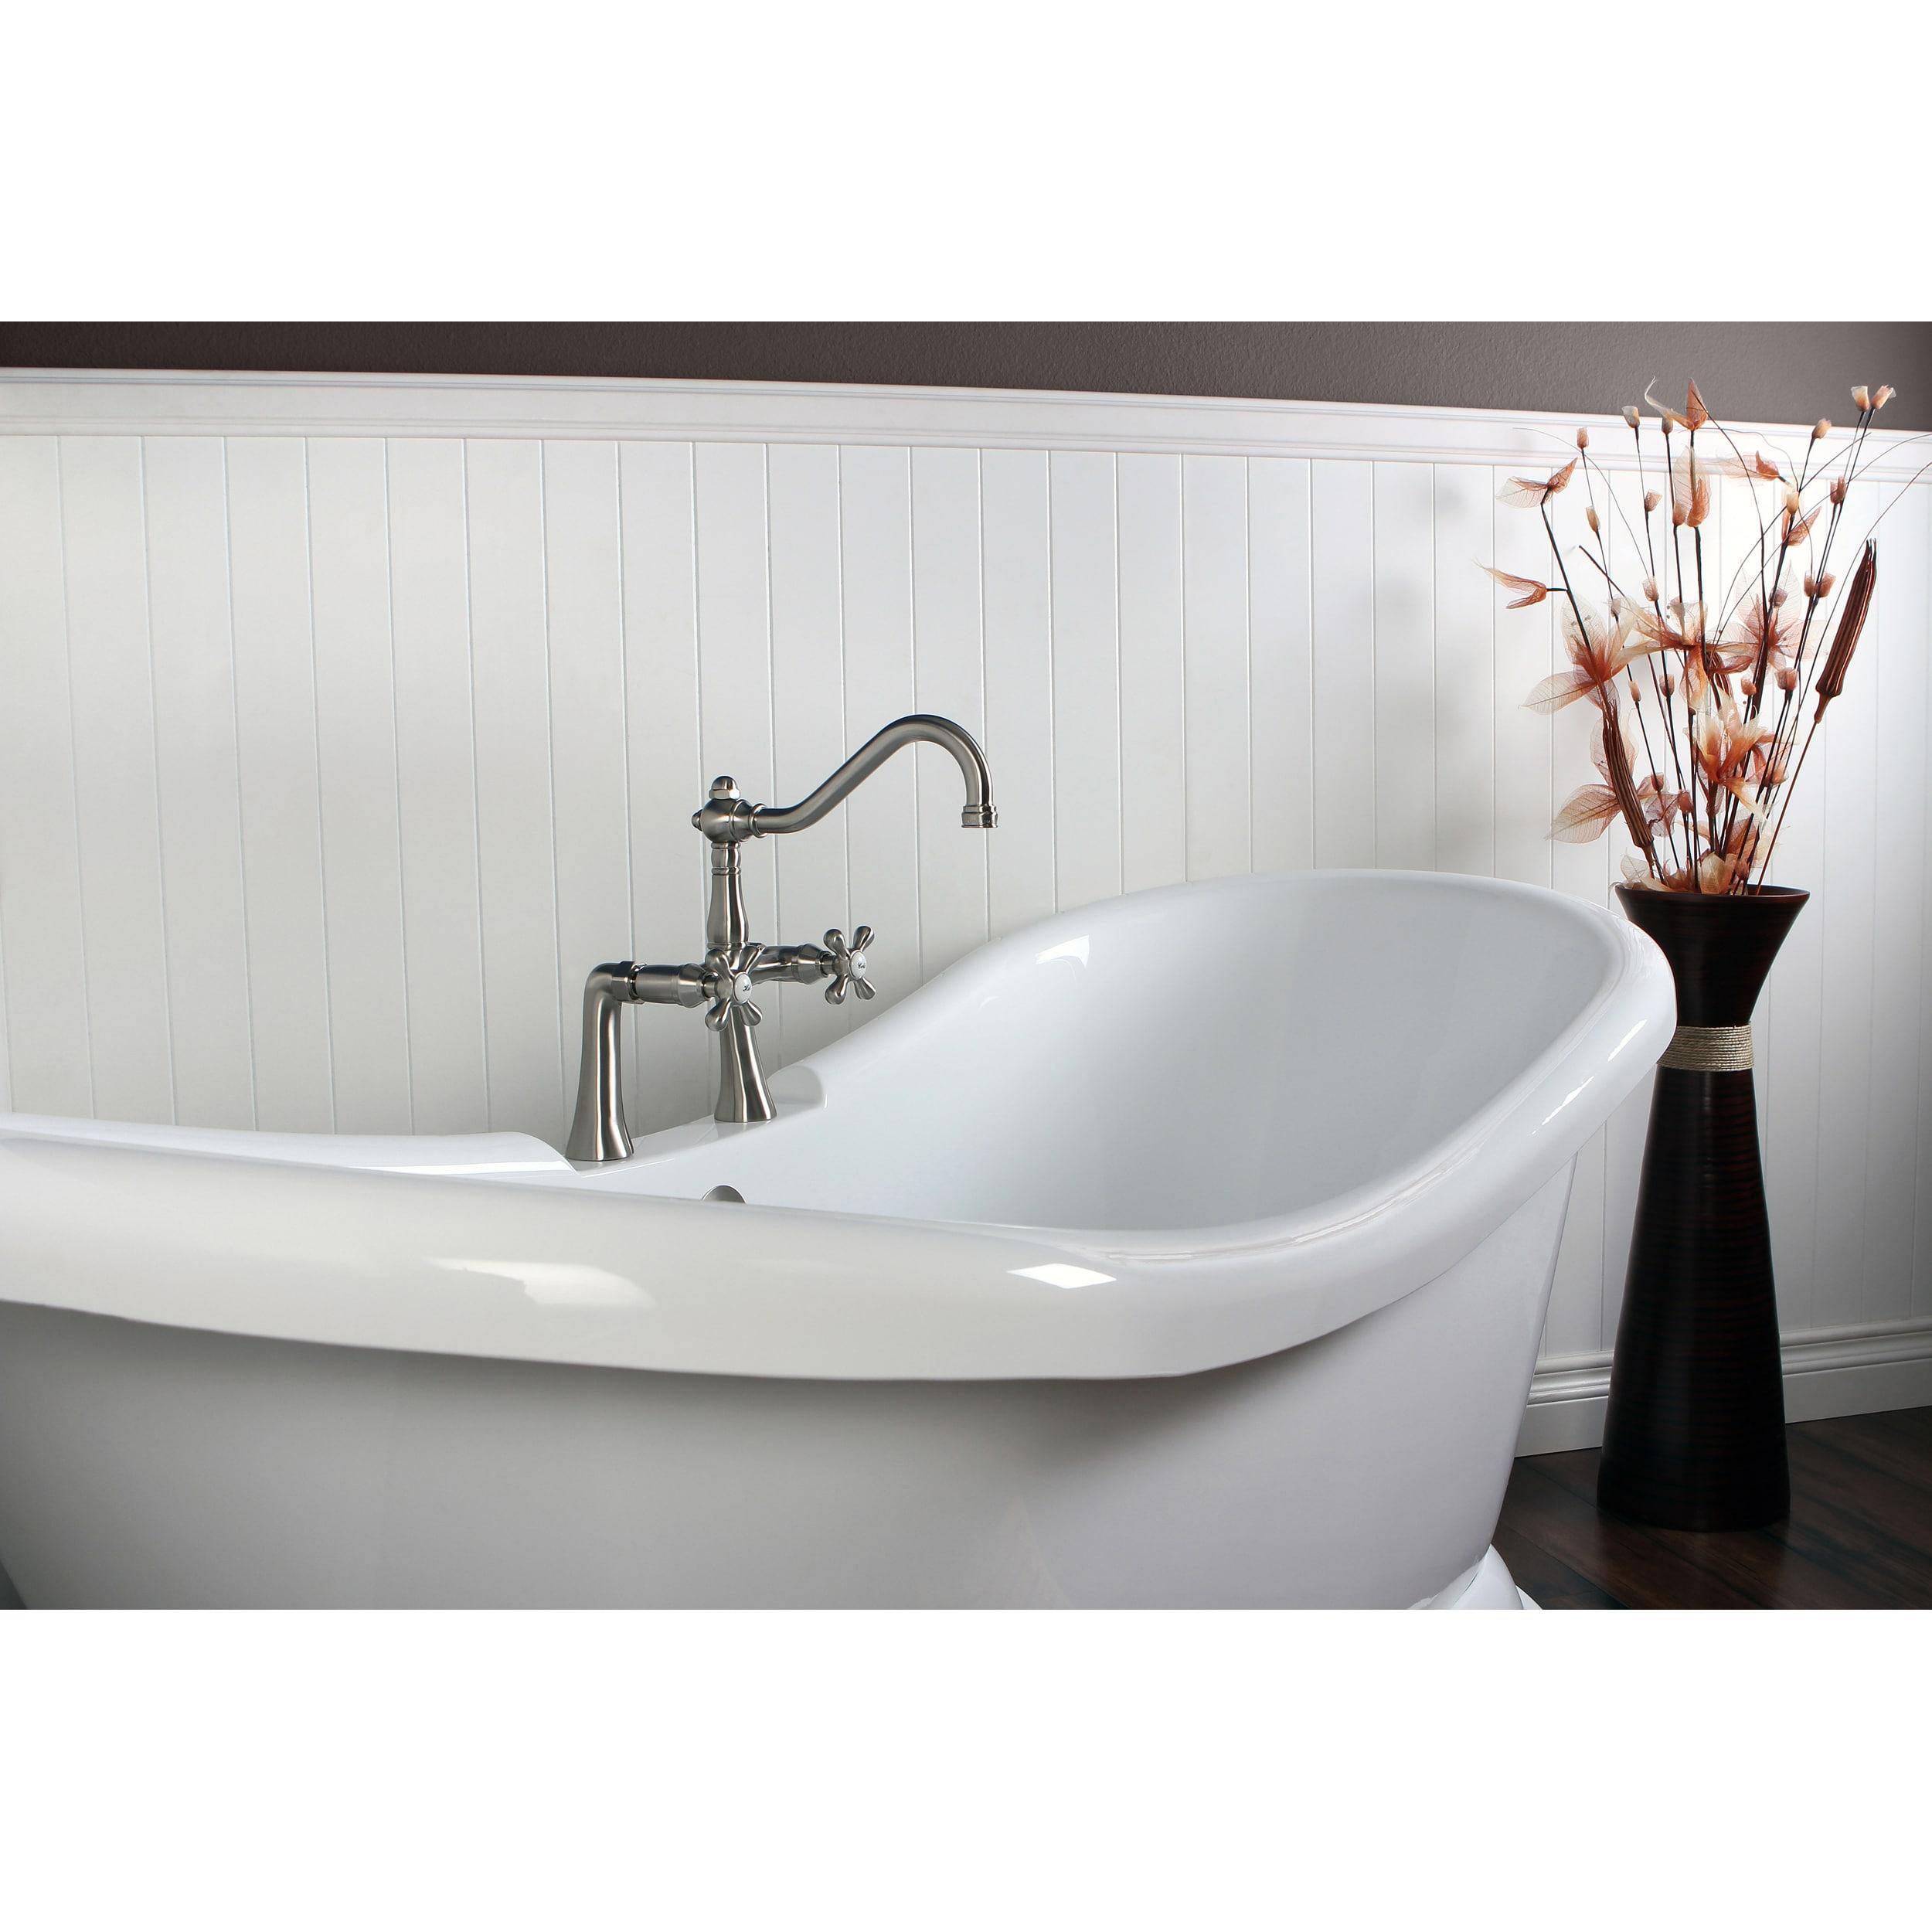 Shop Contemporary Double Slipper 69-inch Pedestal Bathtub - Free ...